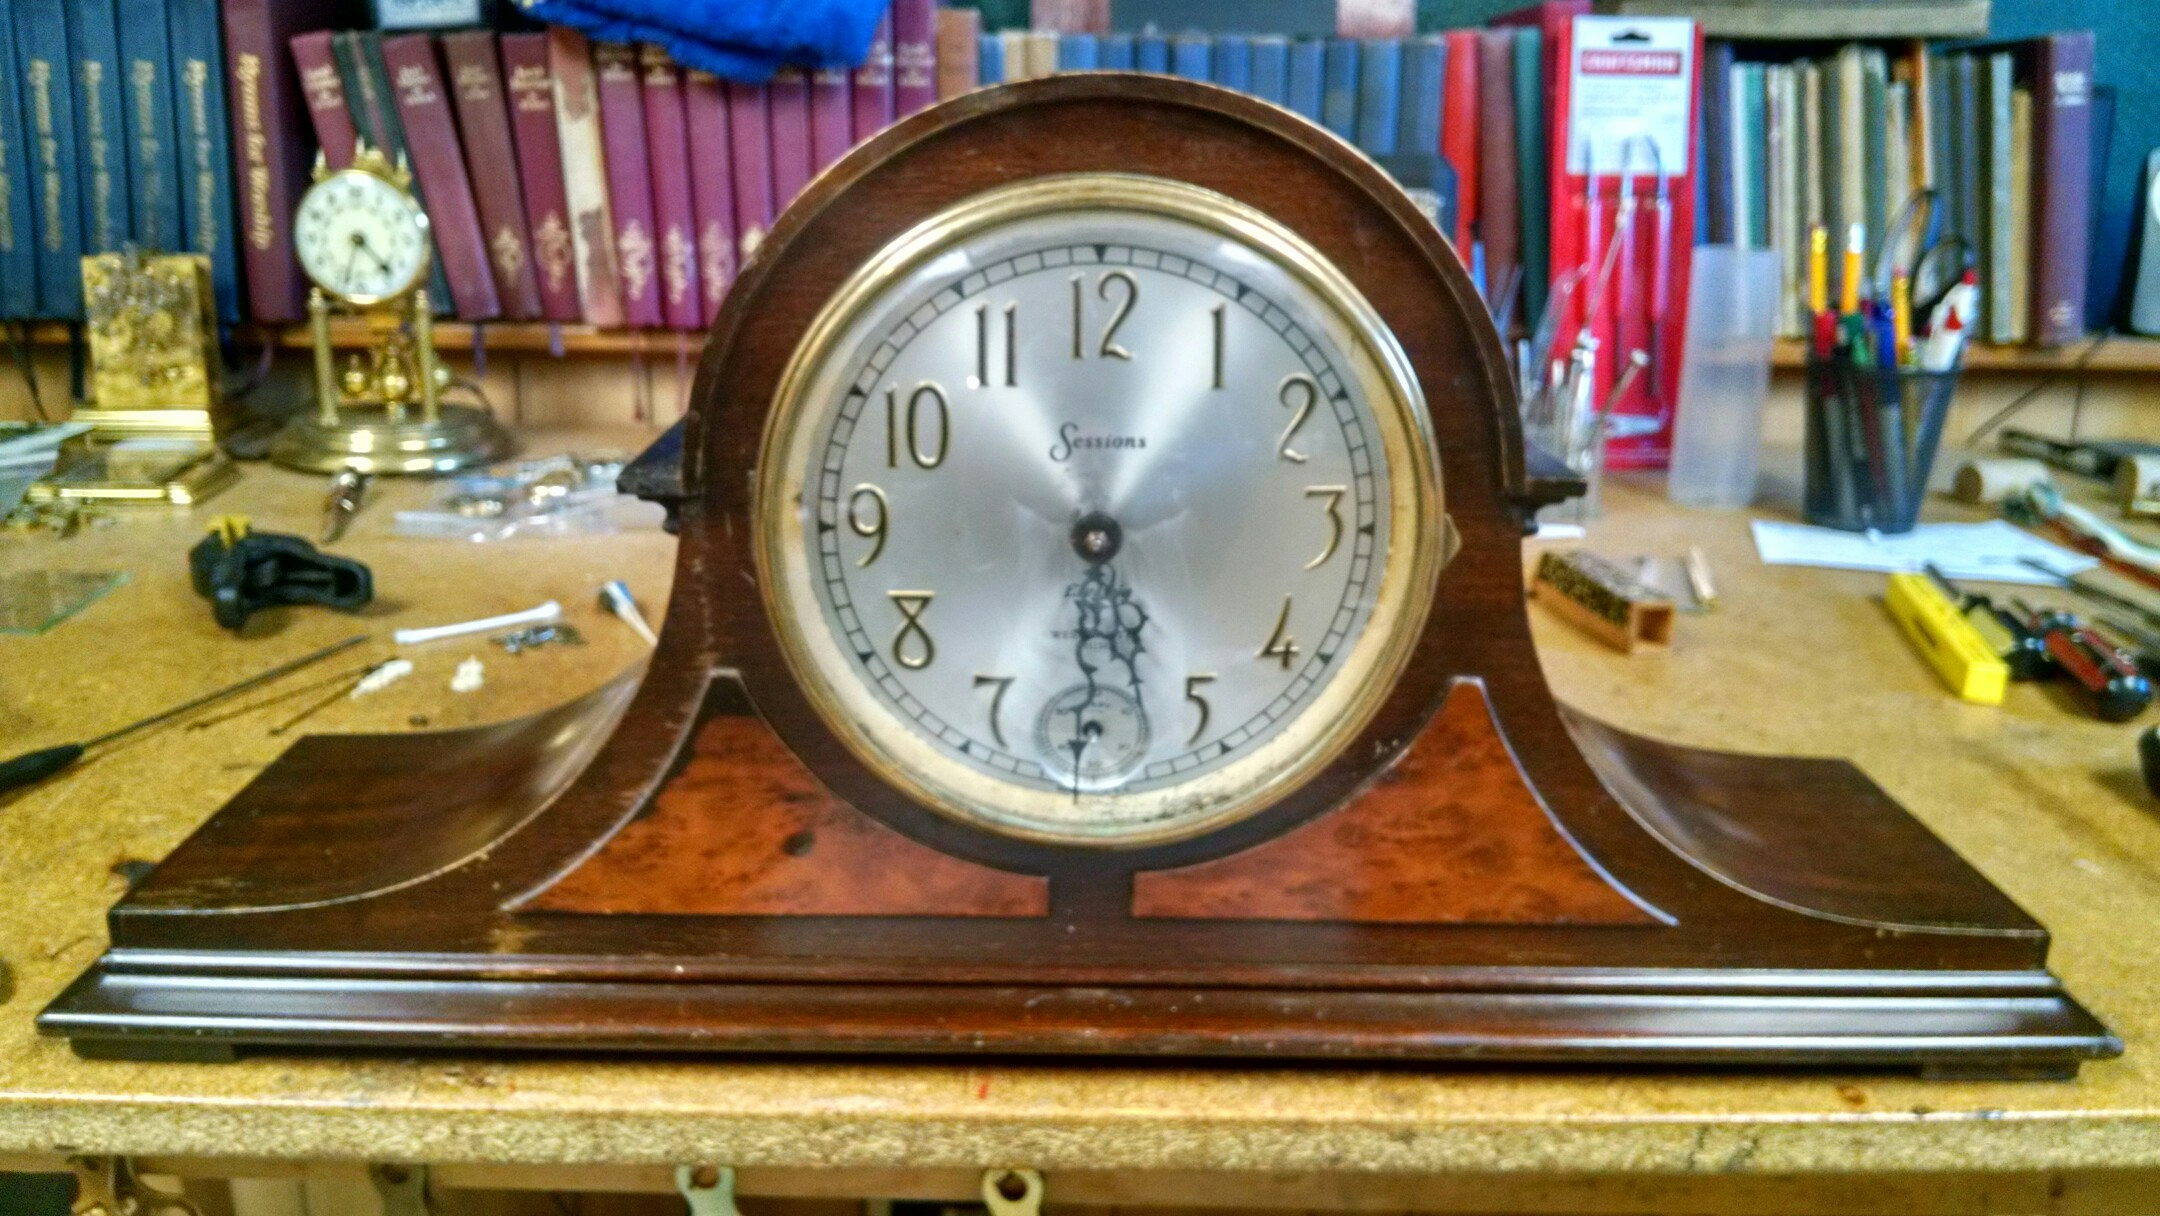 Clock Gallery Indiana Clockworks 3366 W Sekiu Ct Bloomington In 47404 Yp Com